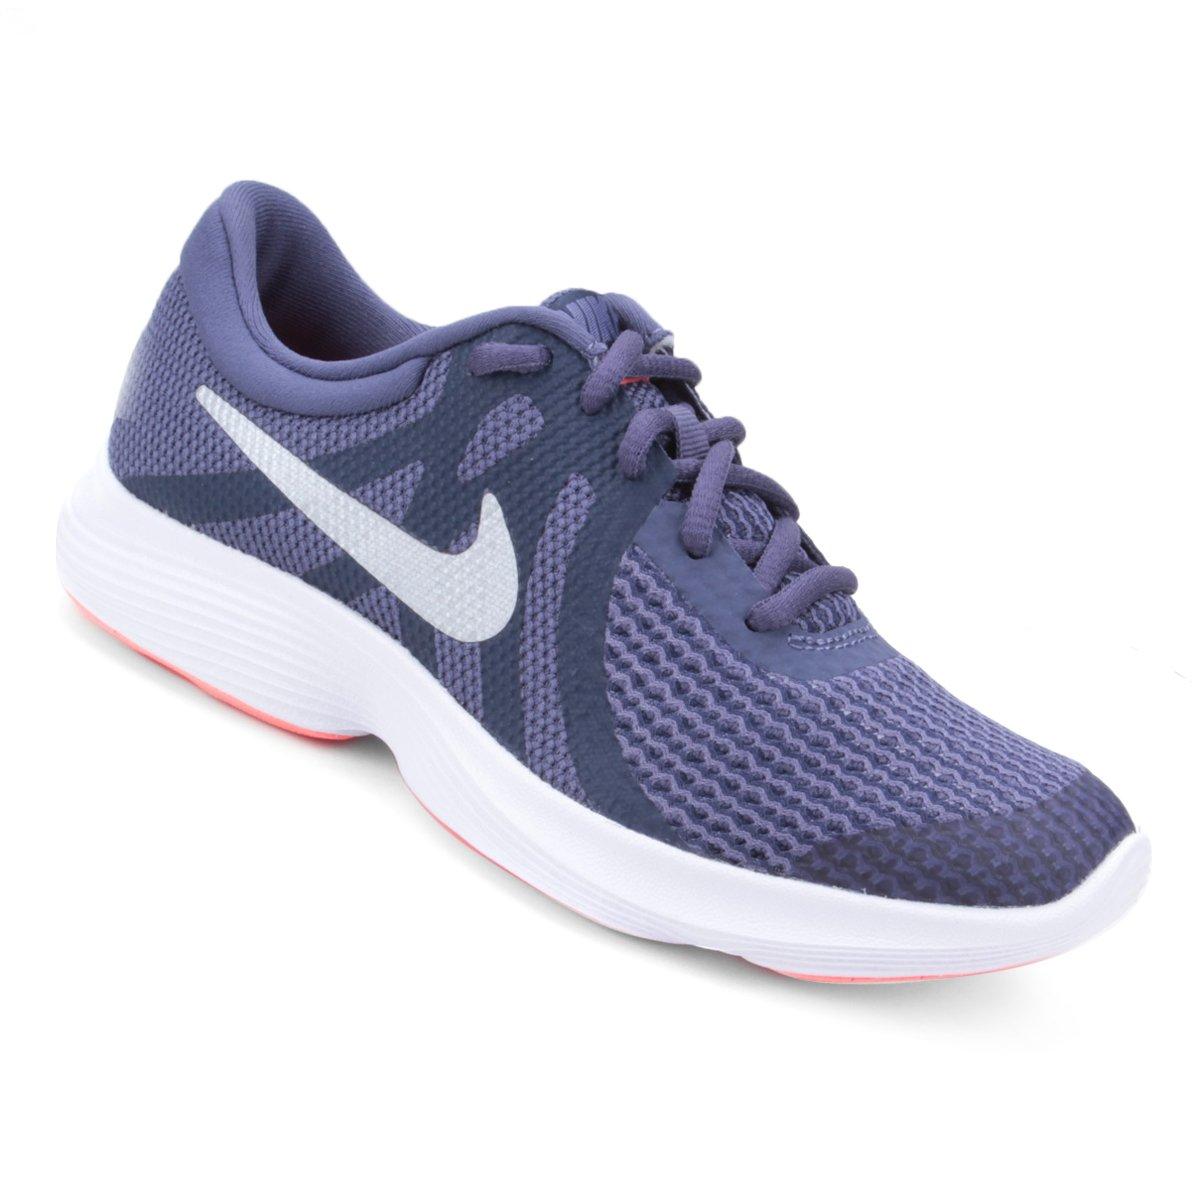 0d52c3b35 Tênis Infantil Masculino Nike Revolution 4 Masculino Infantil Compre Agora  b7e195